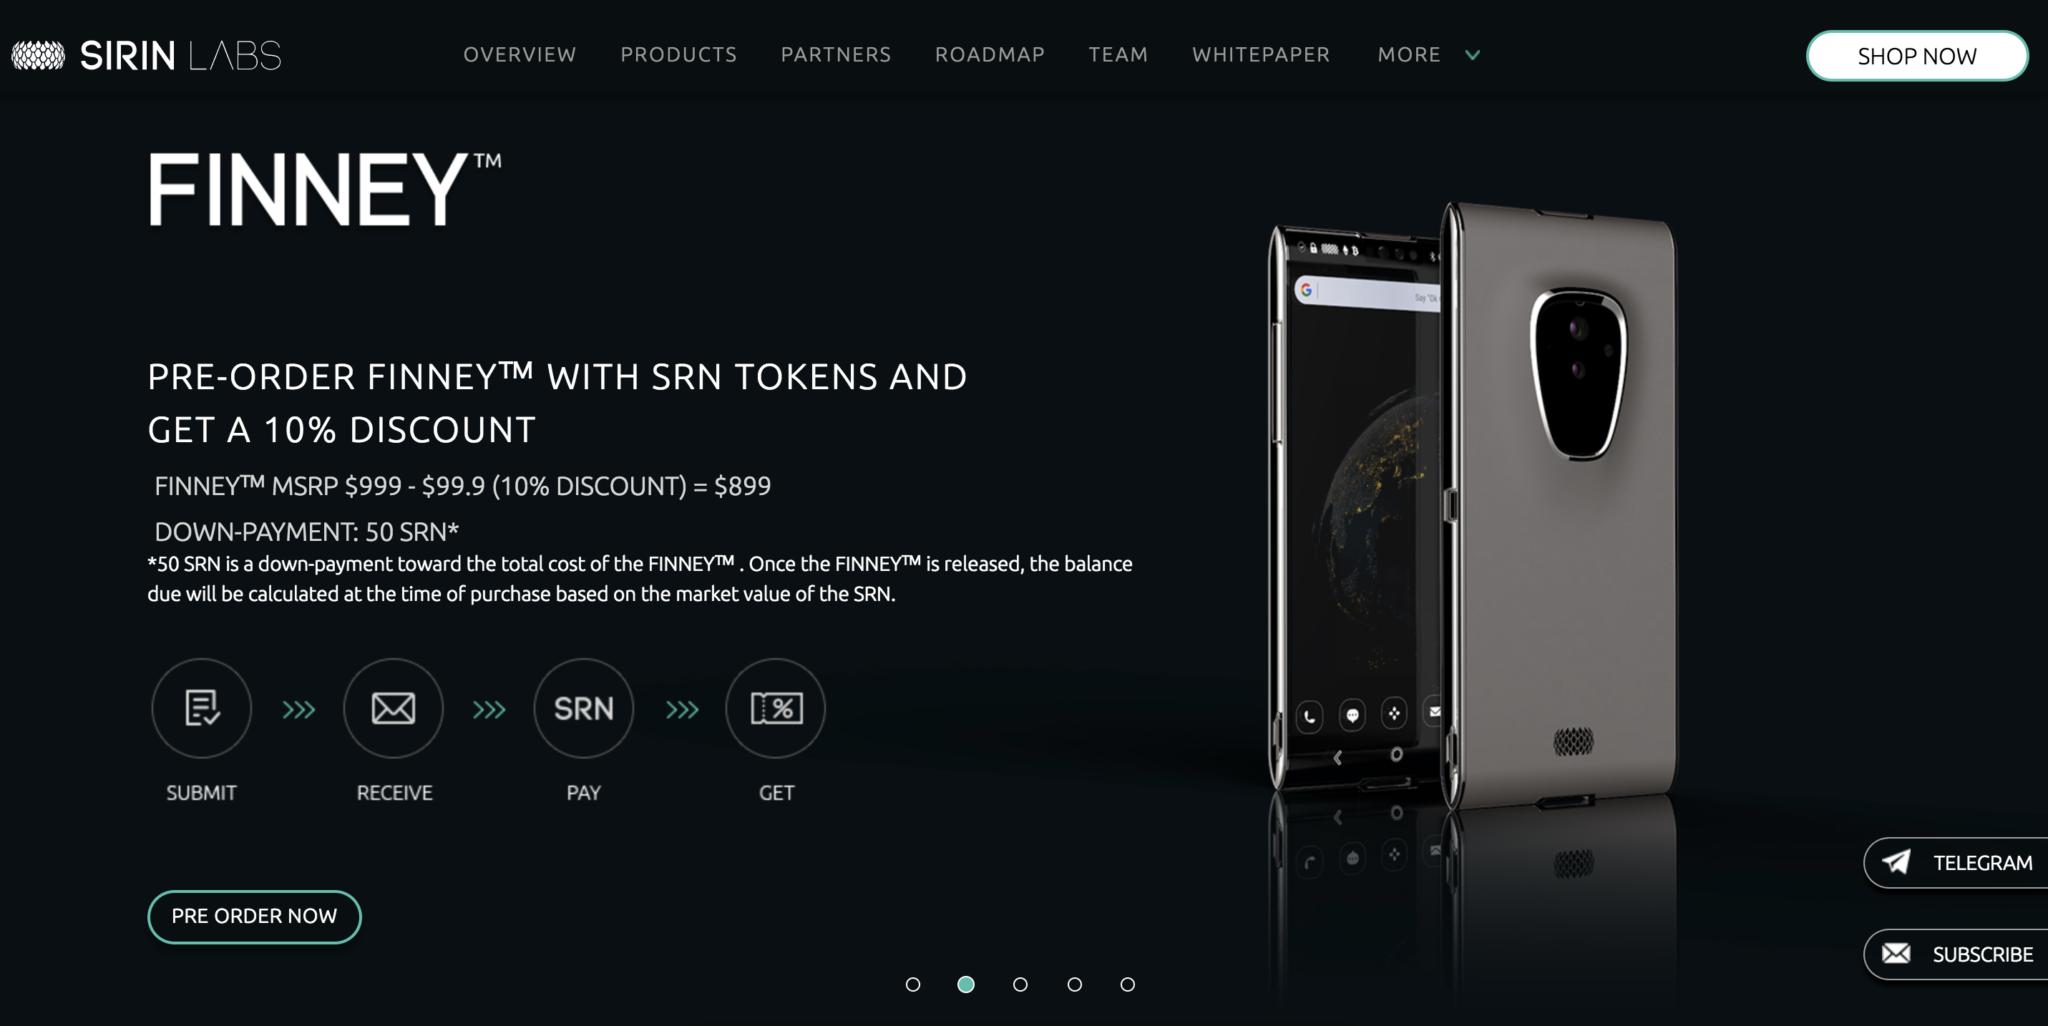 Sirin Labsが世界初のブロックチェーンスマートフォンfinneyの発売日が11月29日に決定!